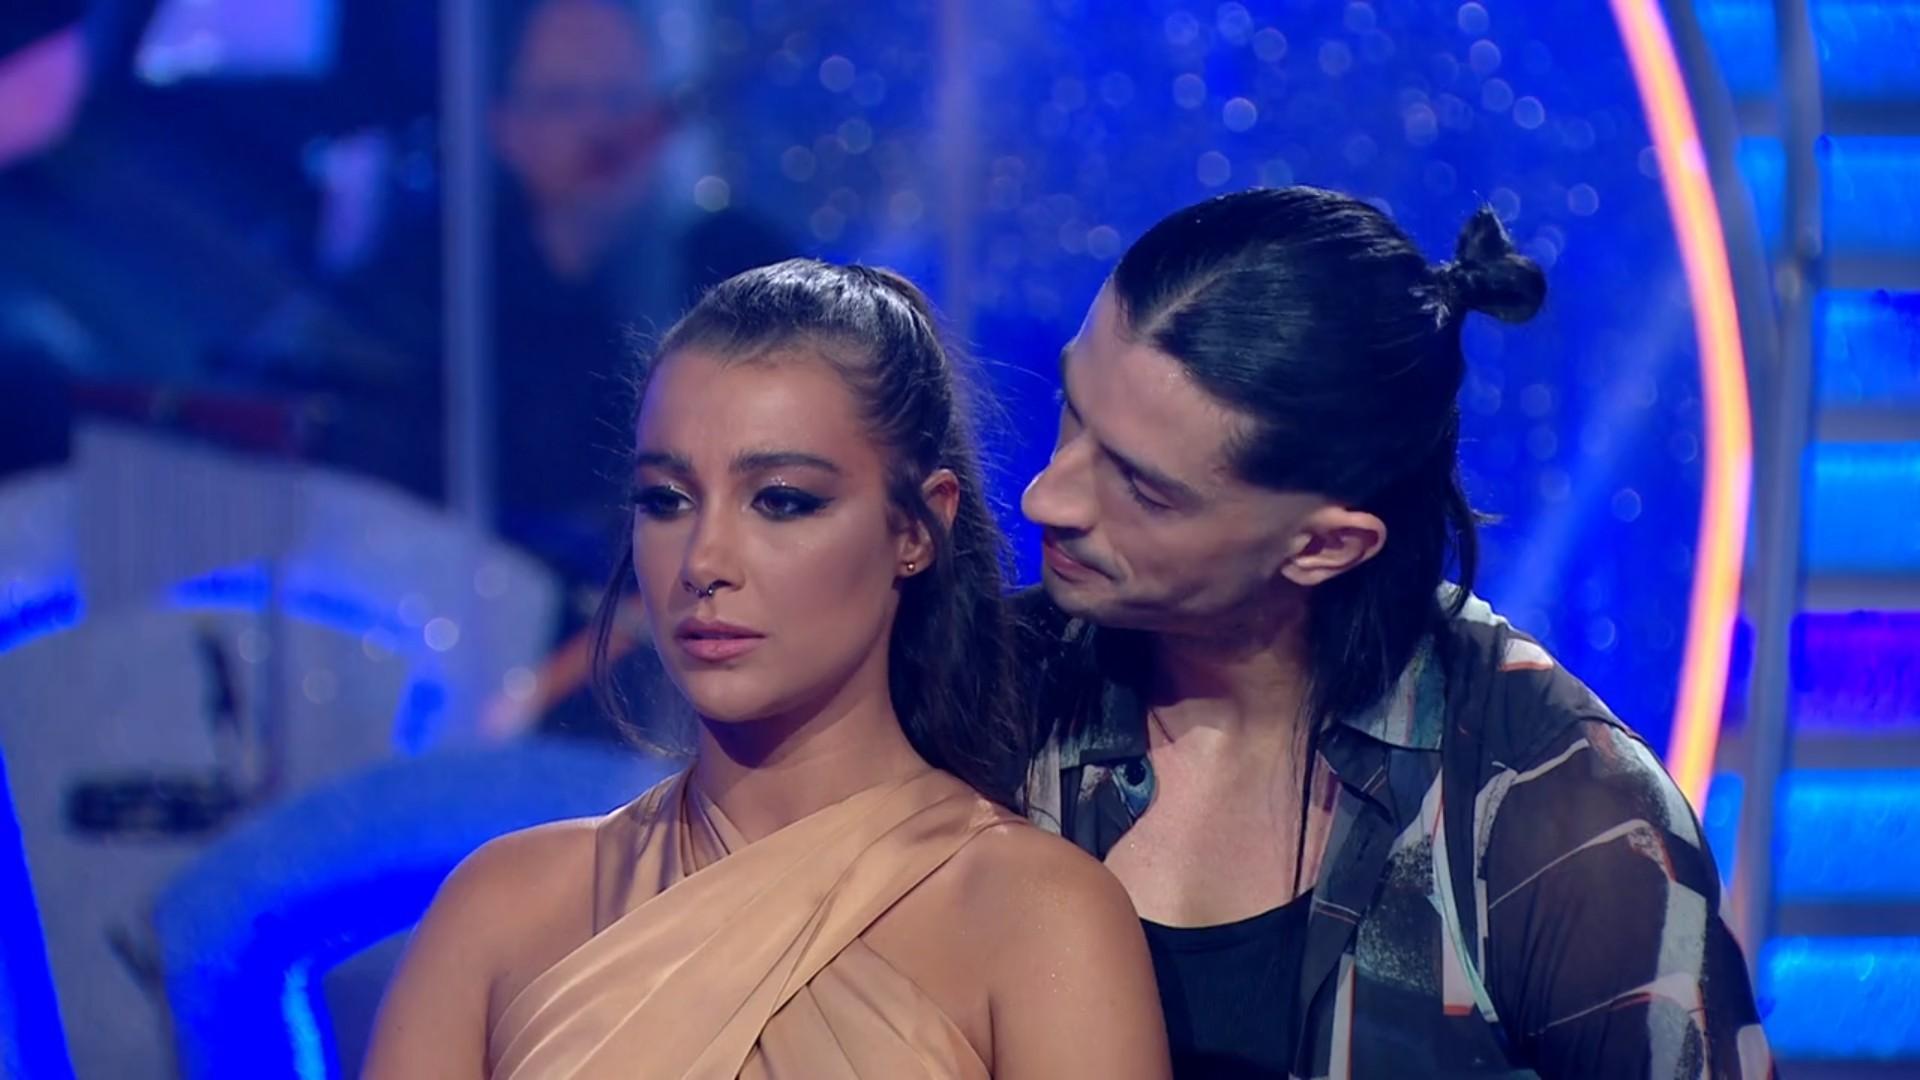 tv2 tóth andi dancing with the stars andrei Mangra